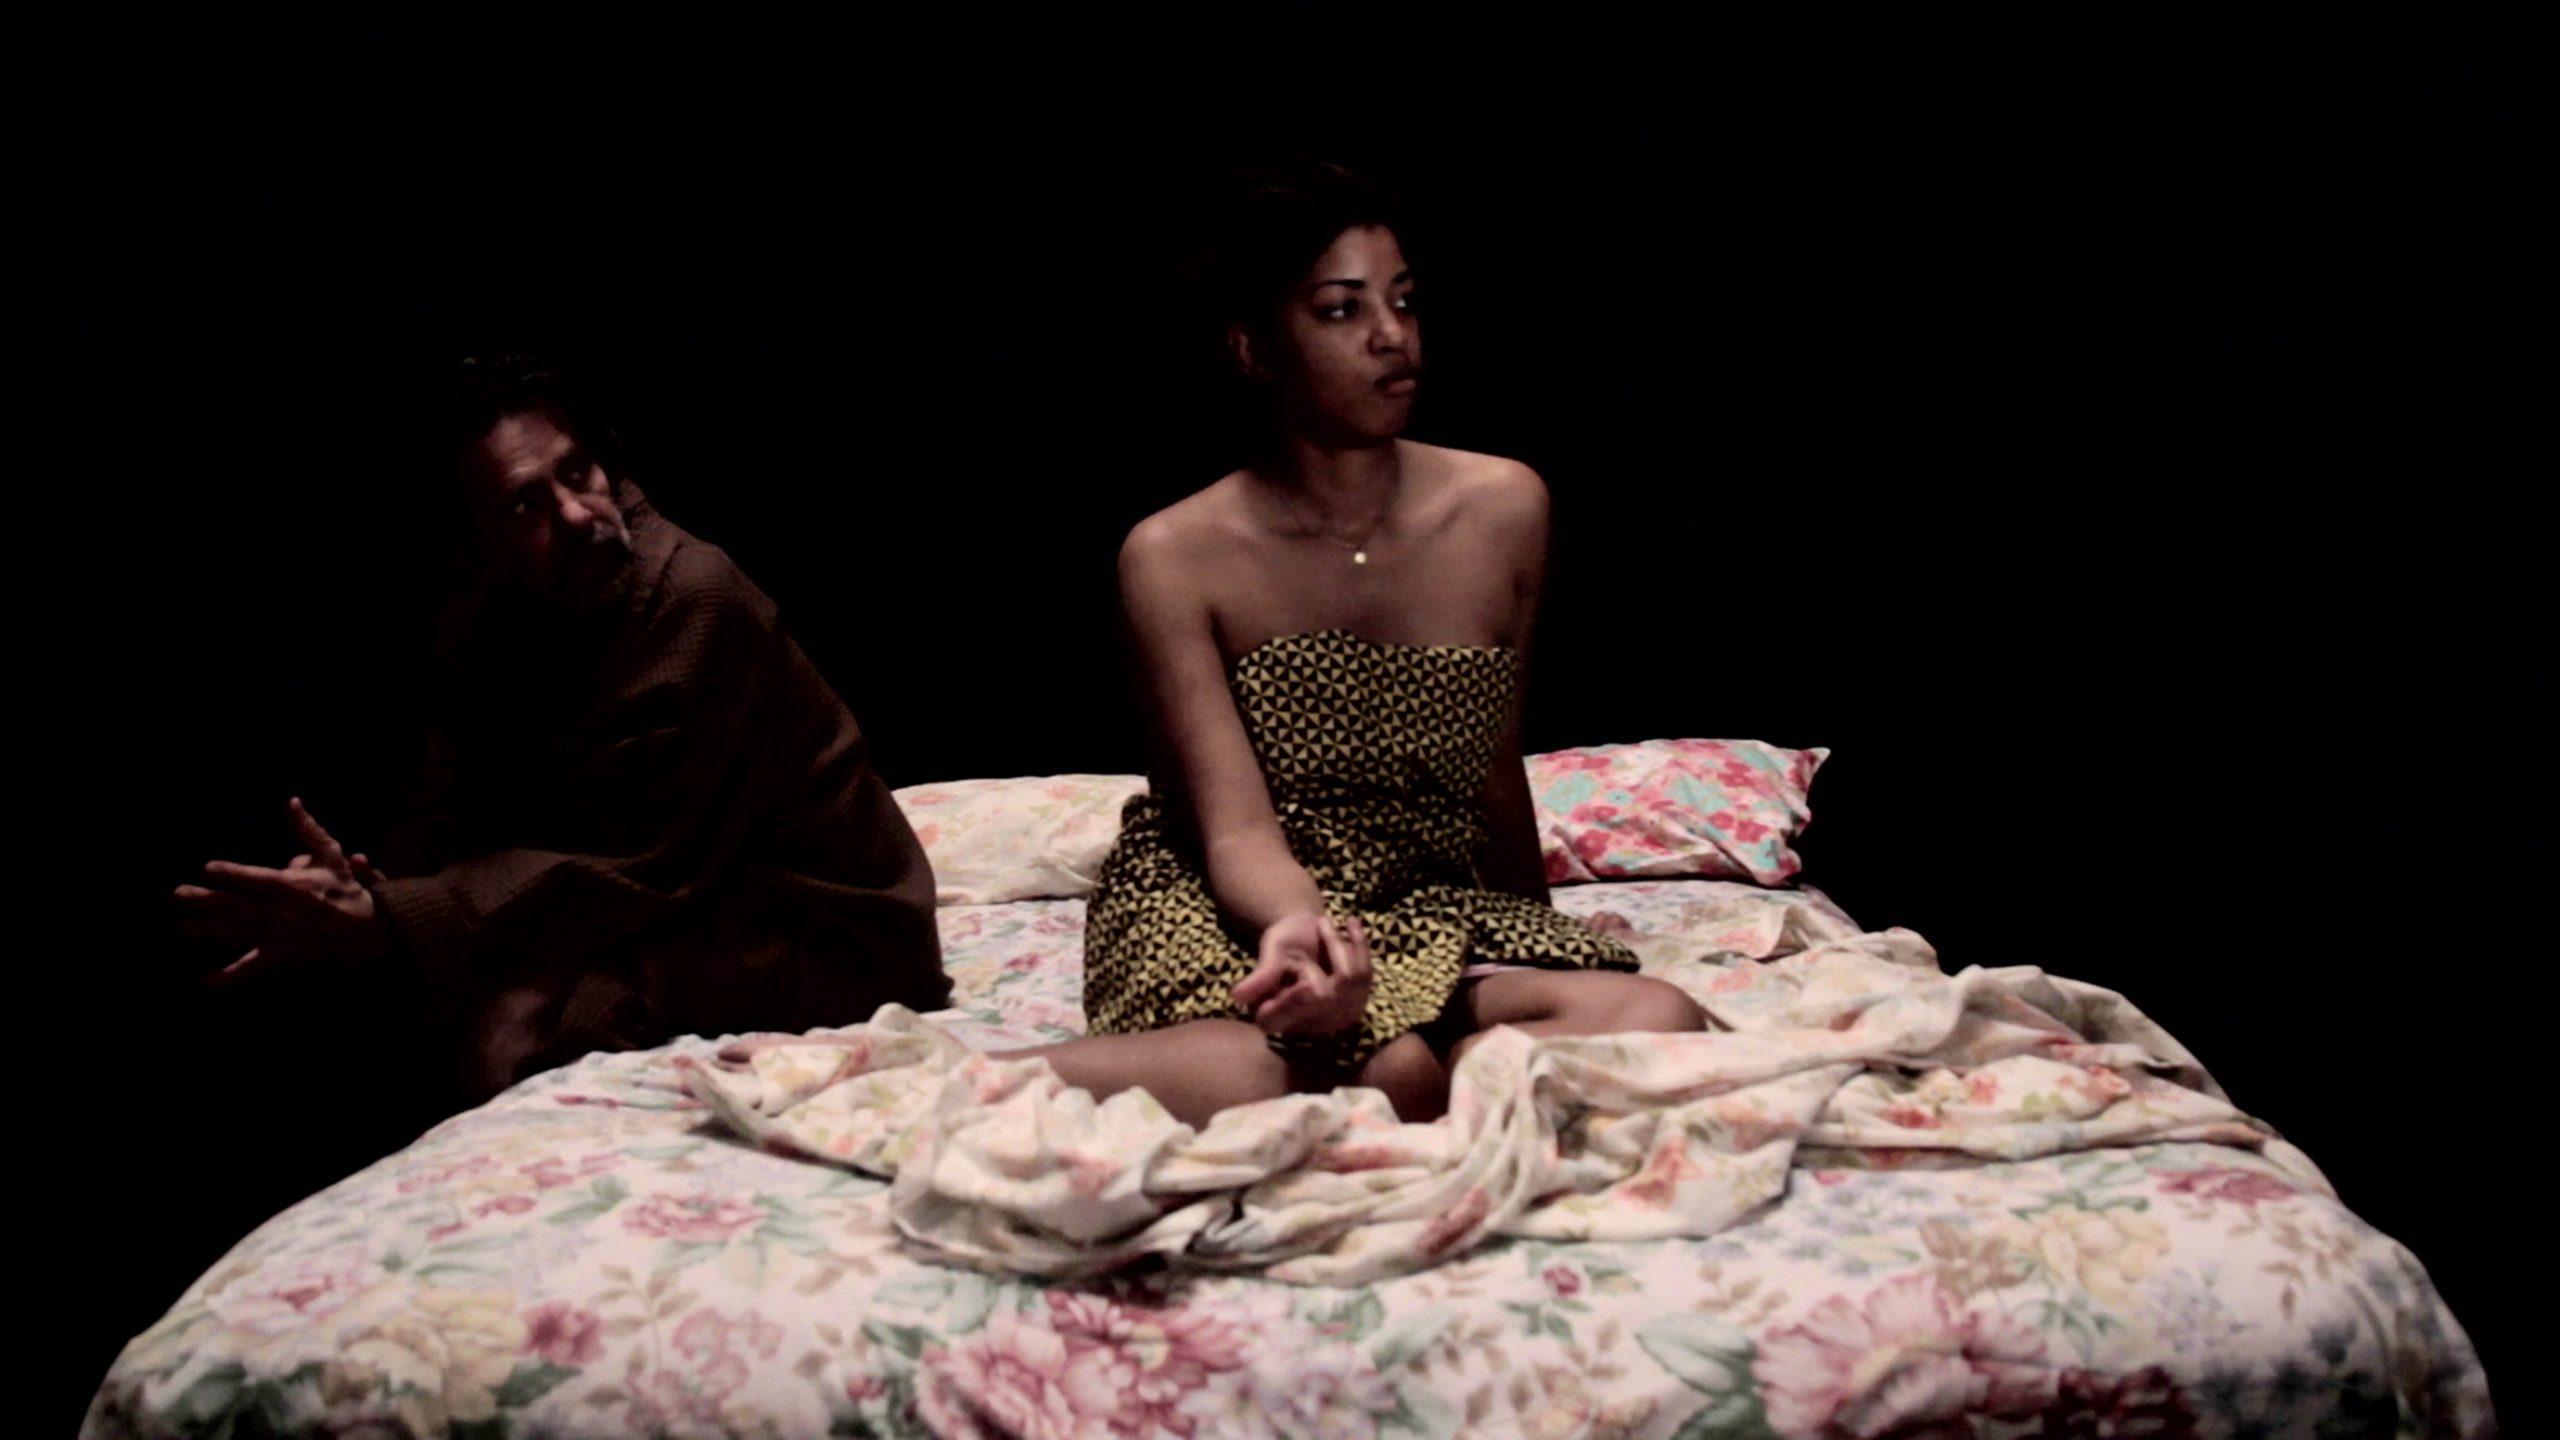 FILM: Dineo Seshee Bopape